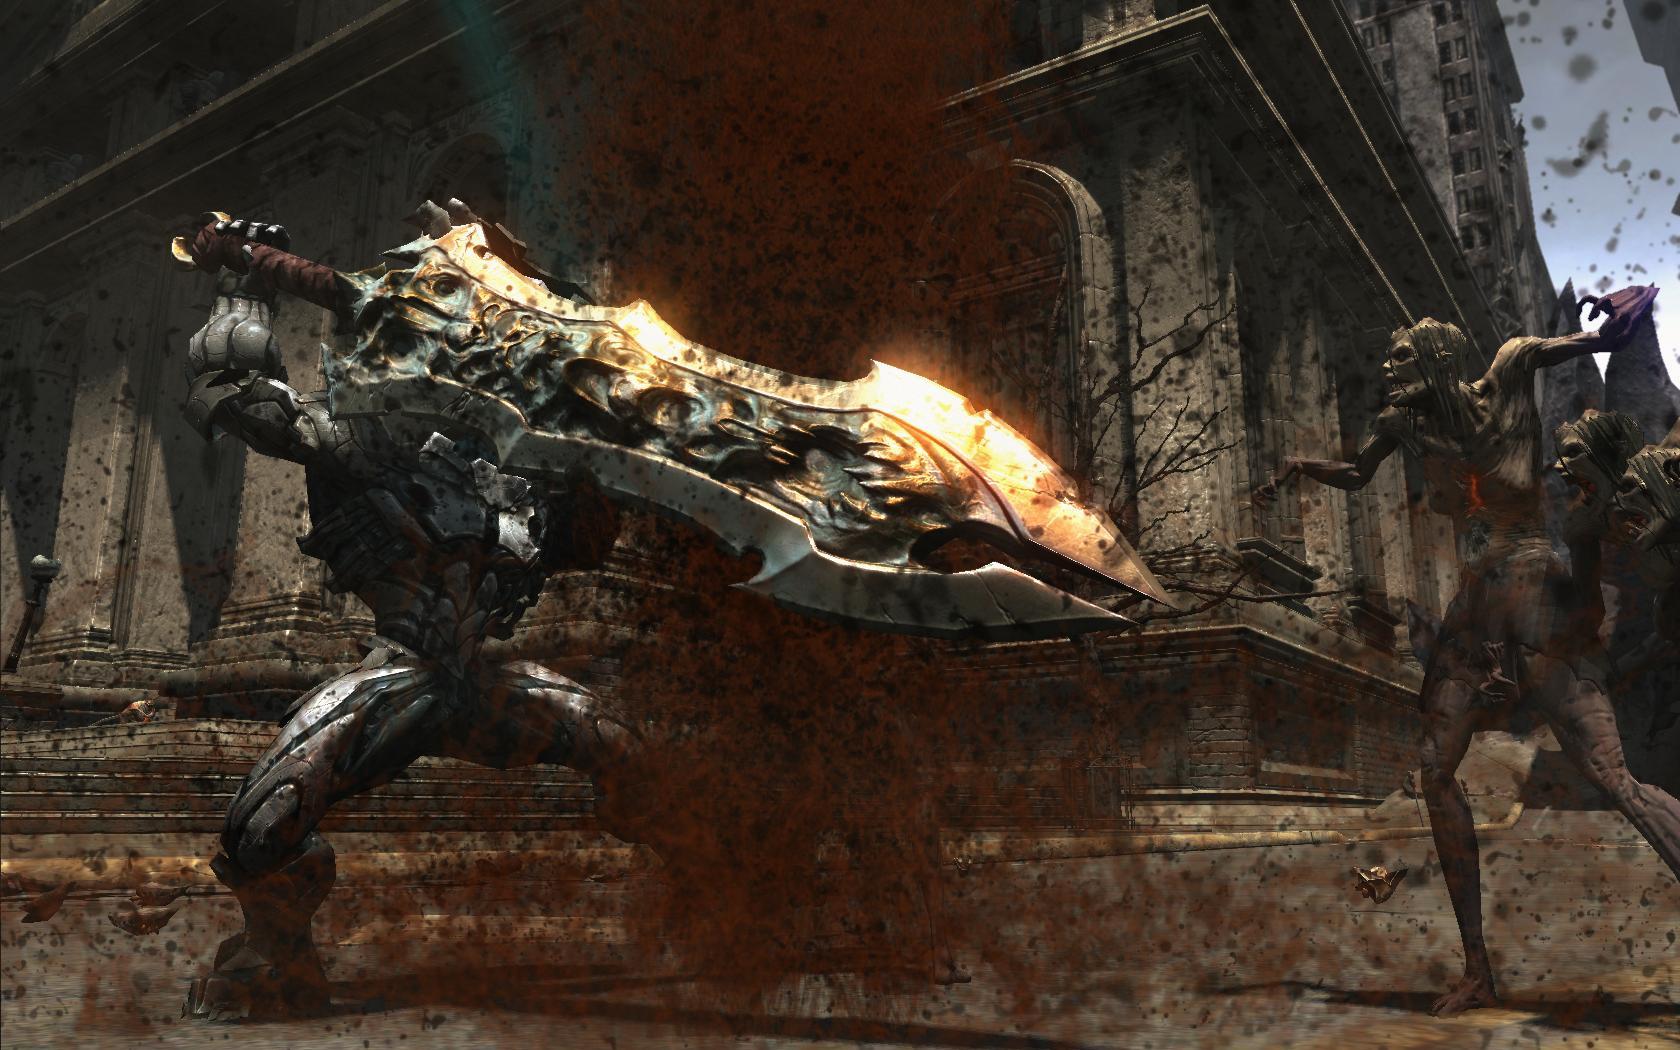 Darksiders: Wrath of War - hands-on | GamesRadar+